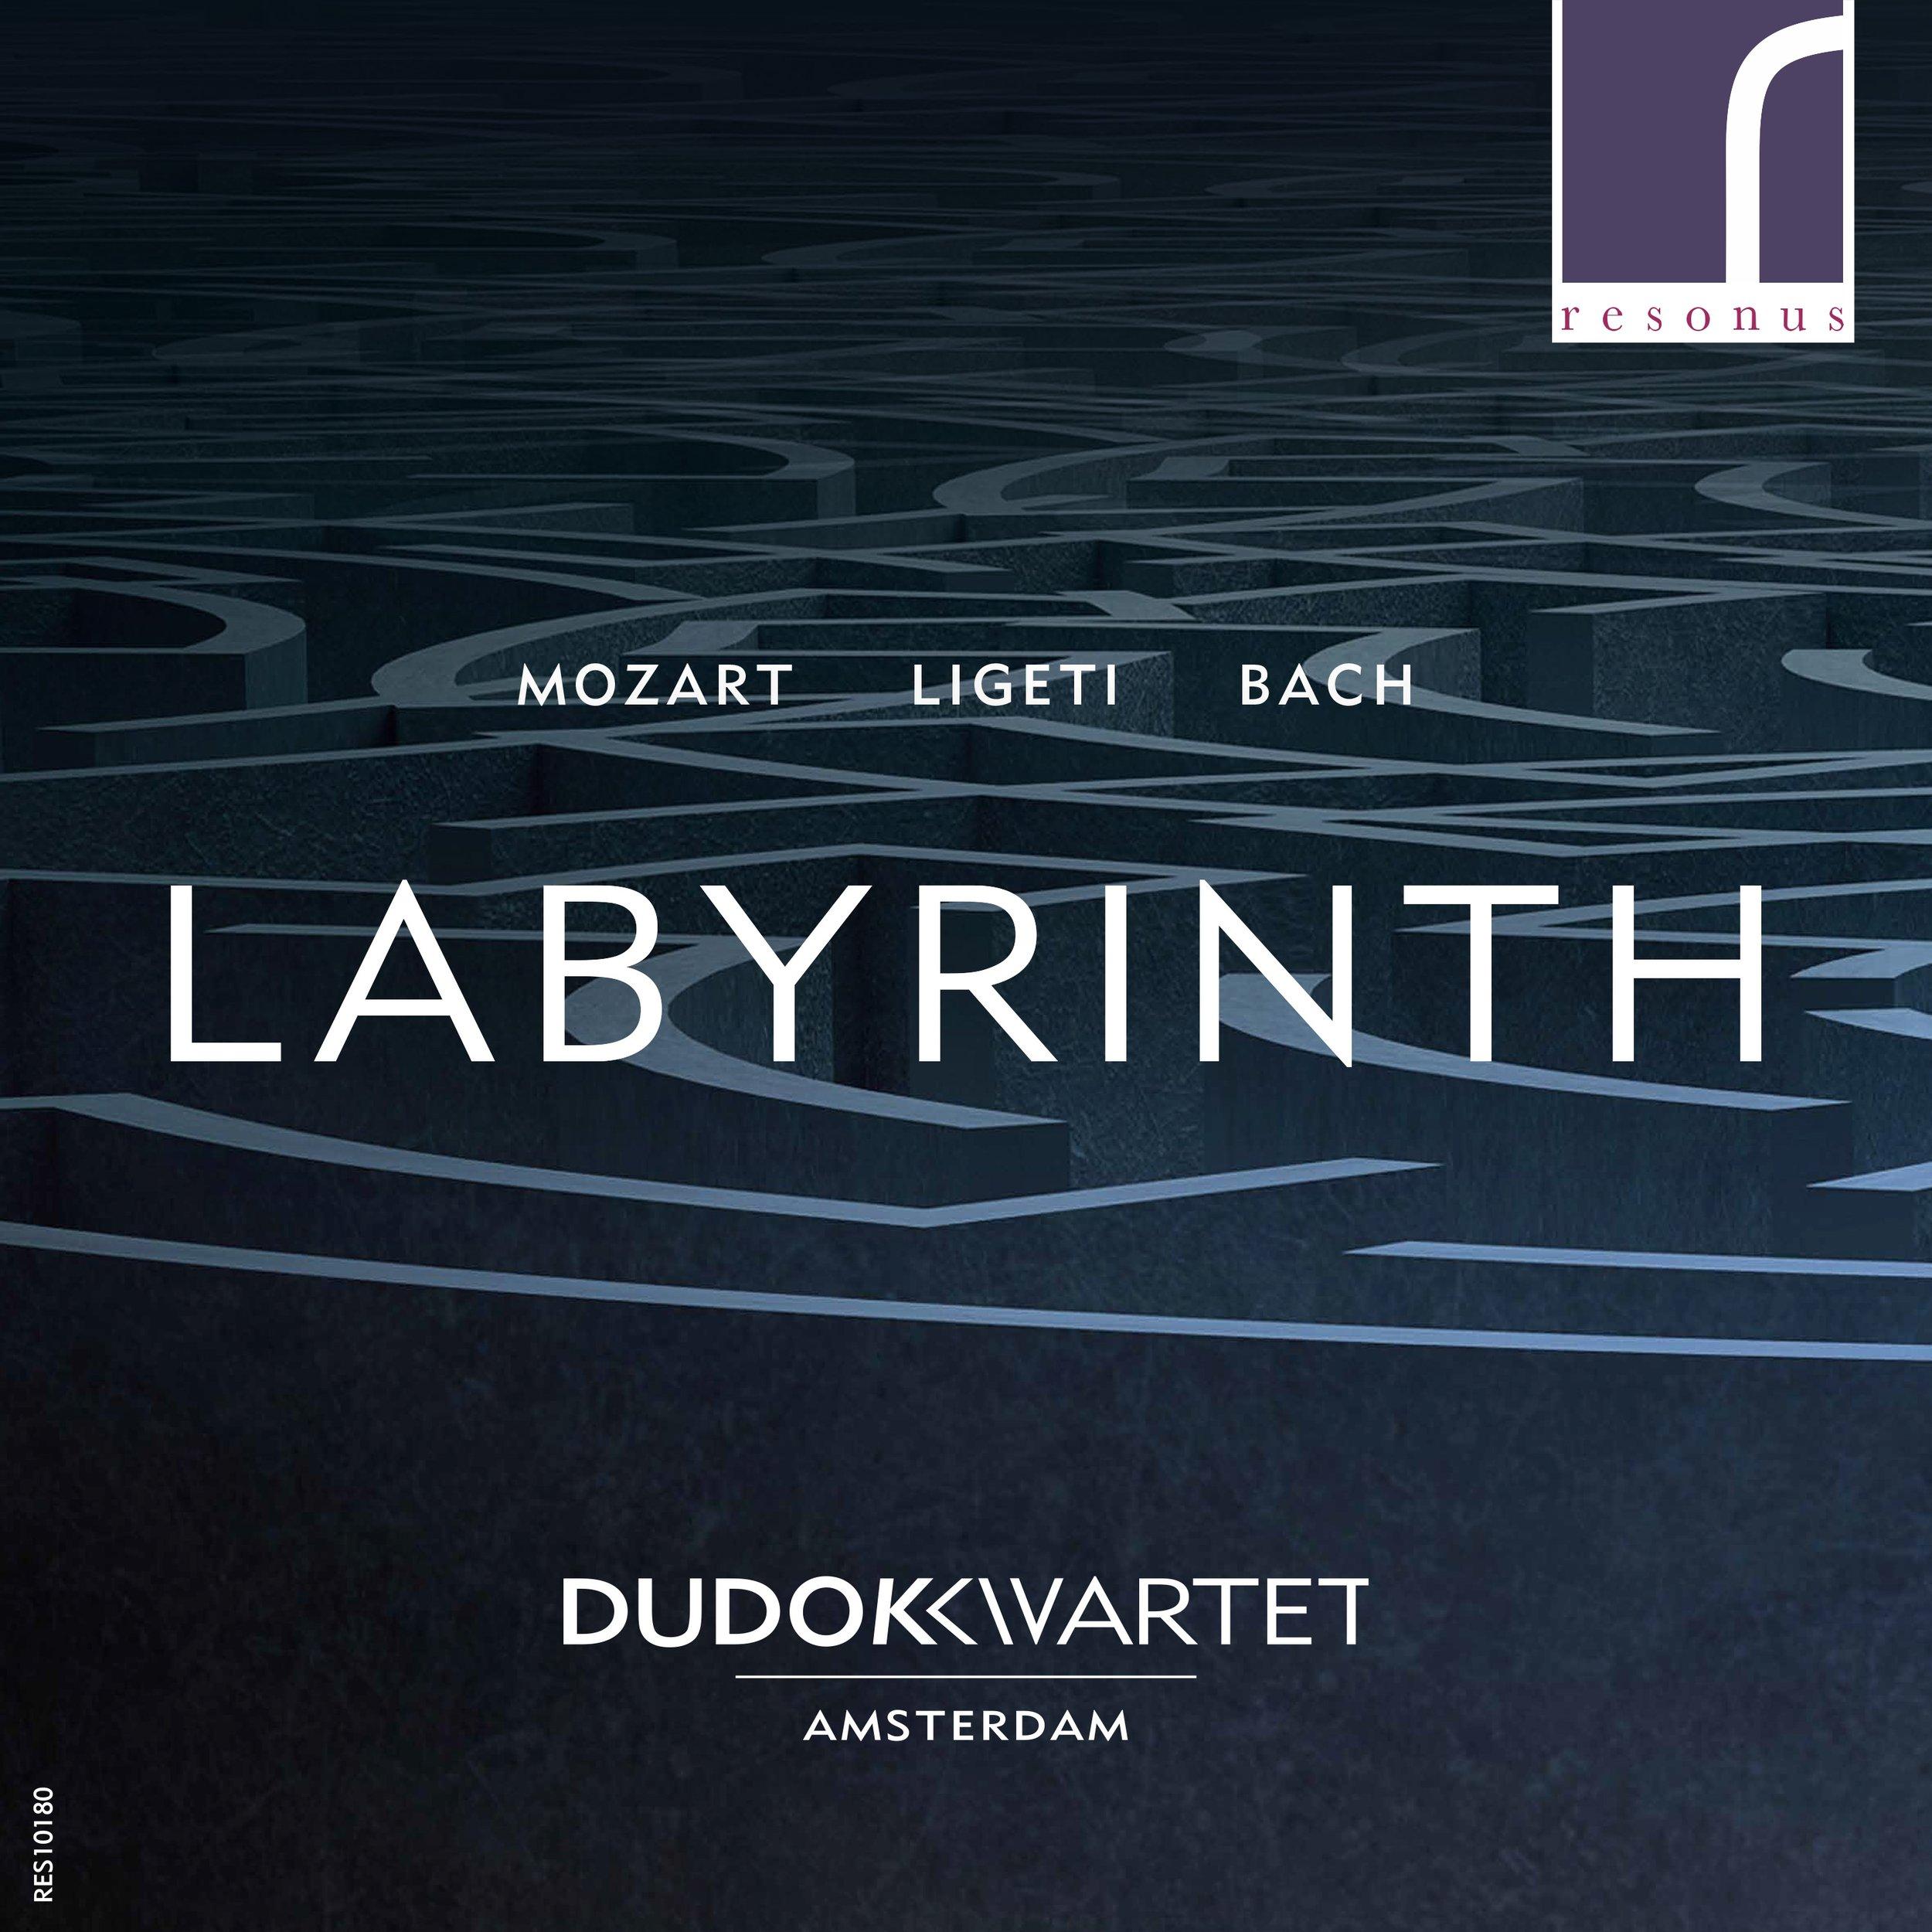 Dudok Labyrinth.jpg